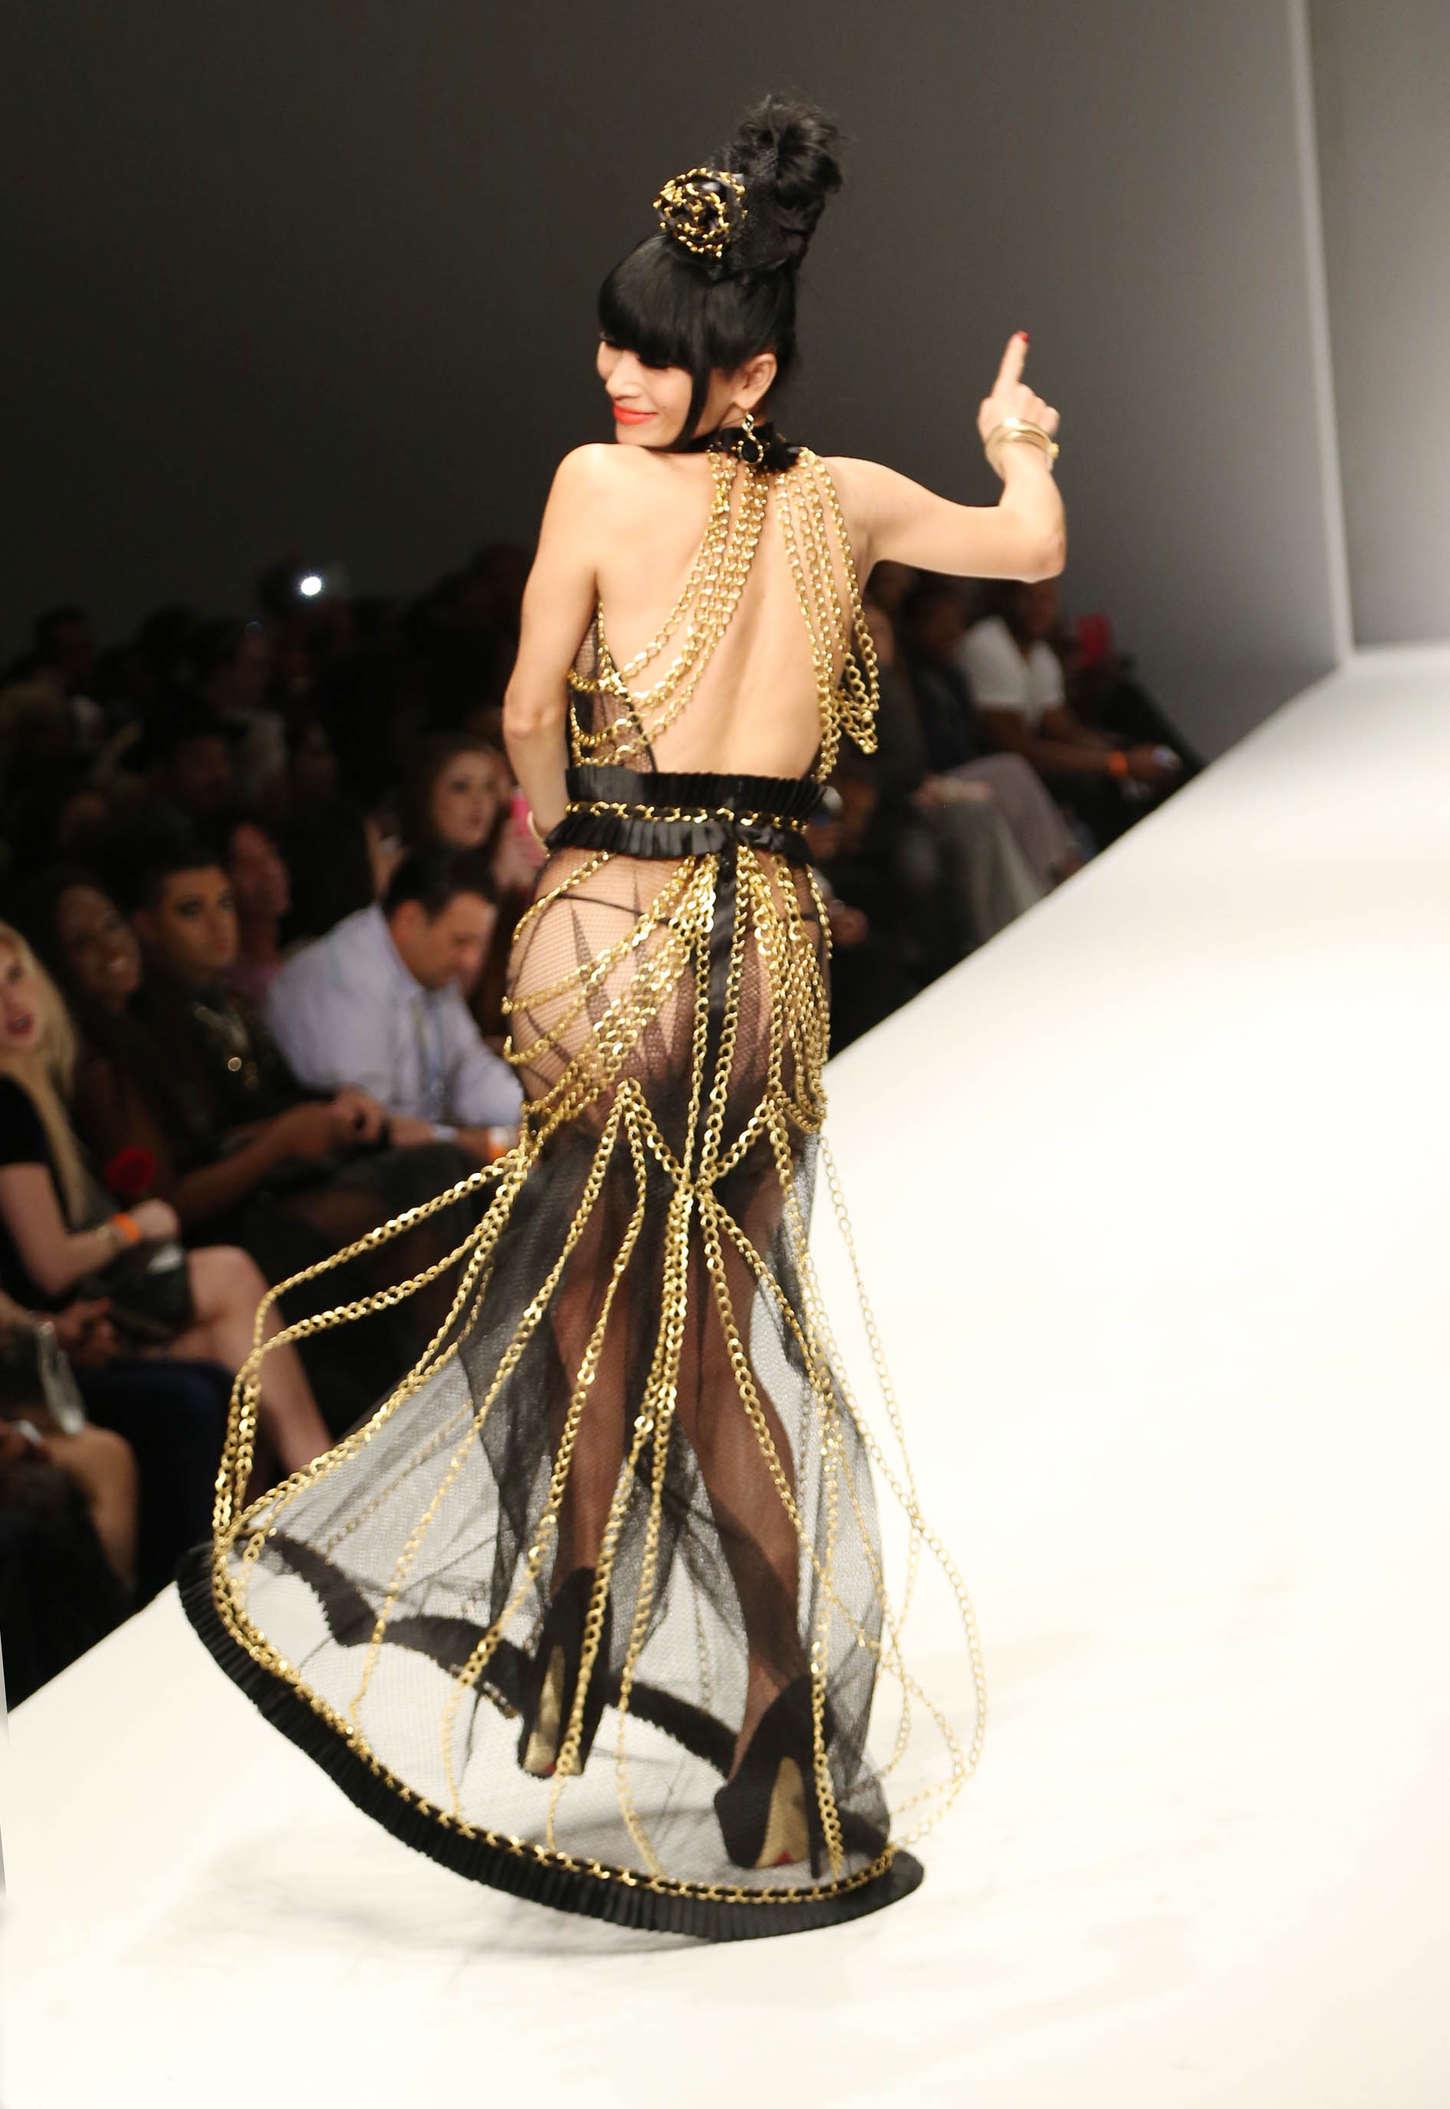 Bai Ling Style Fashion Week 2015 03 Gotceleb